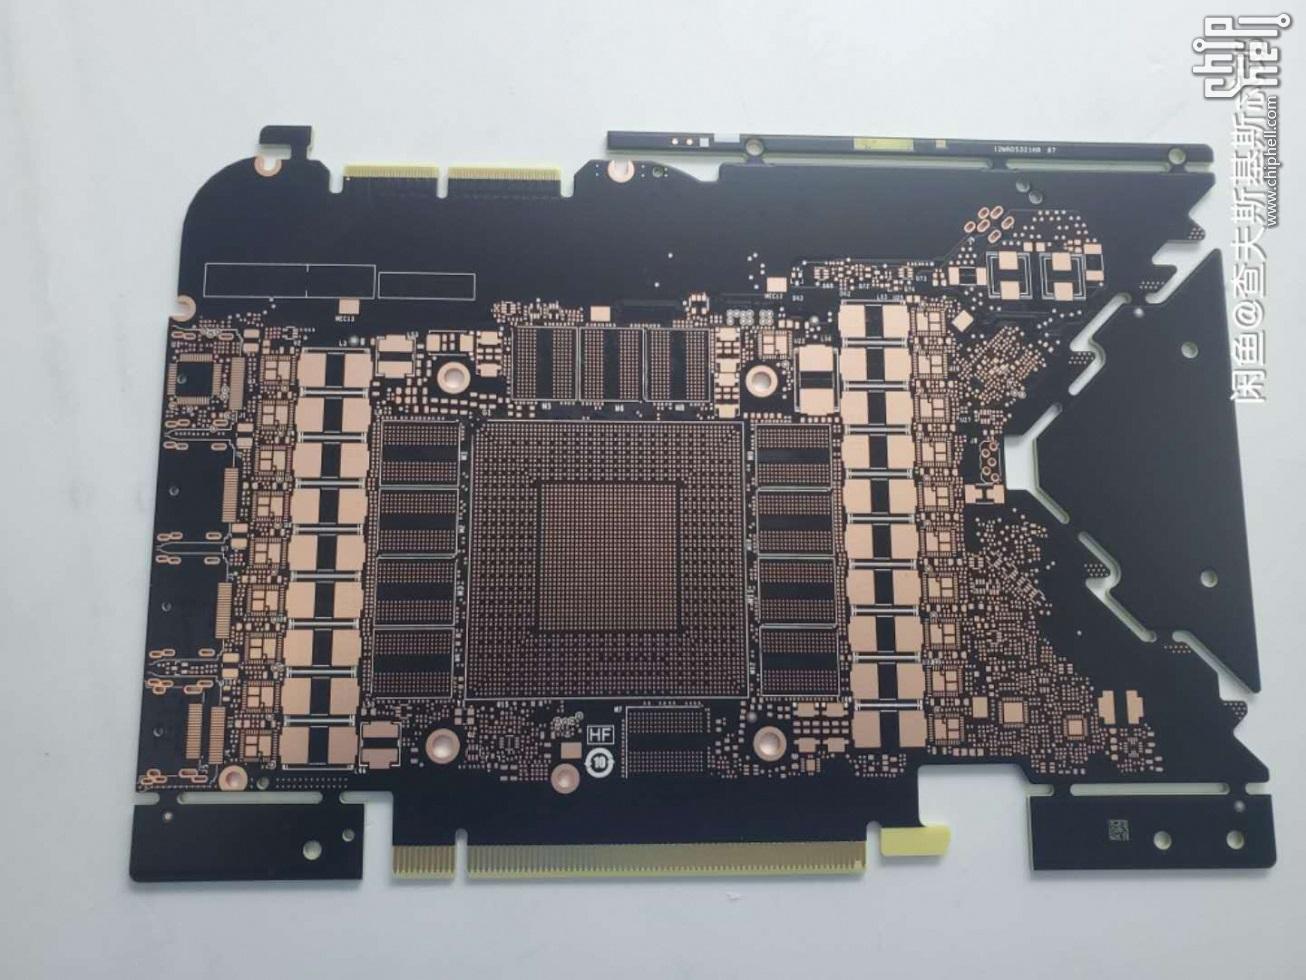 nvidia-geforce-rtx-3090-graphics-card-pcb_1